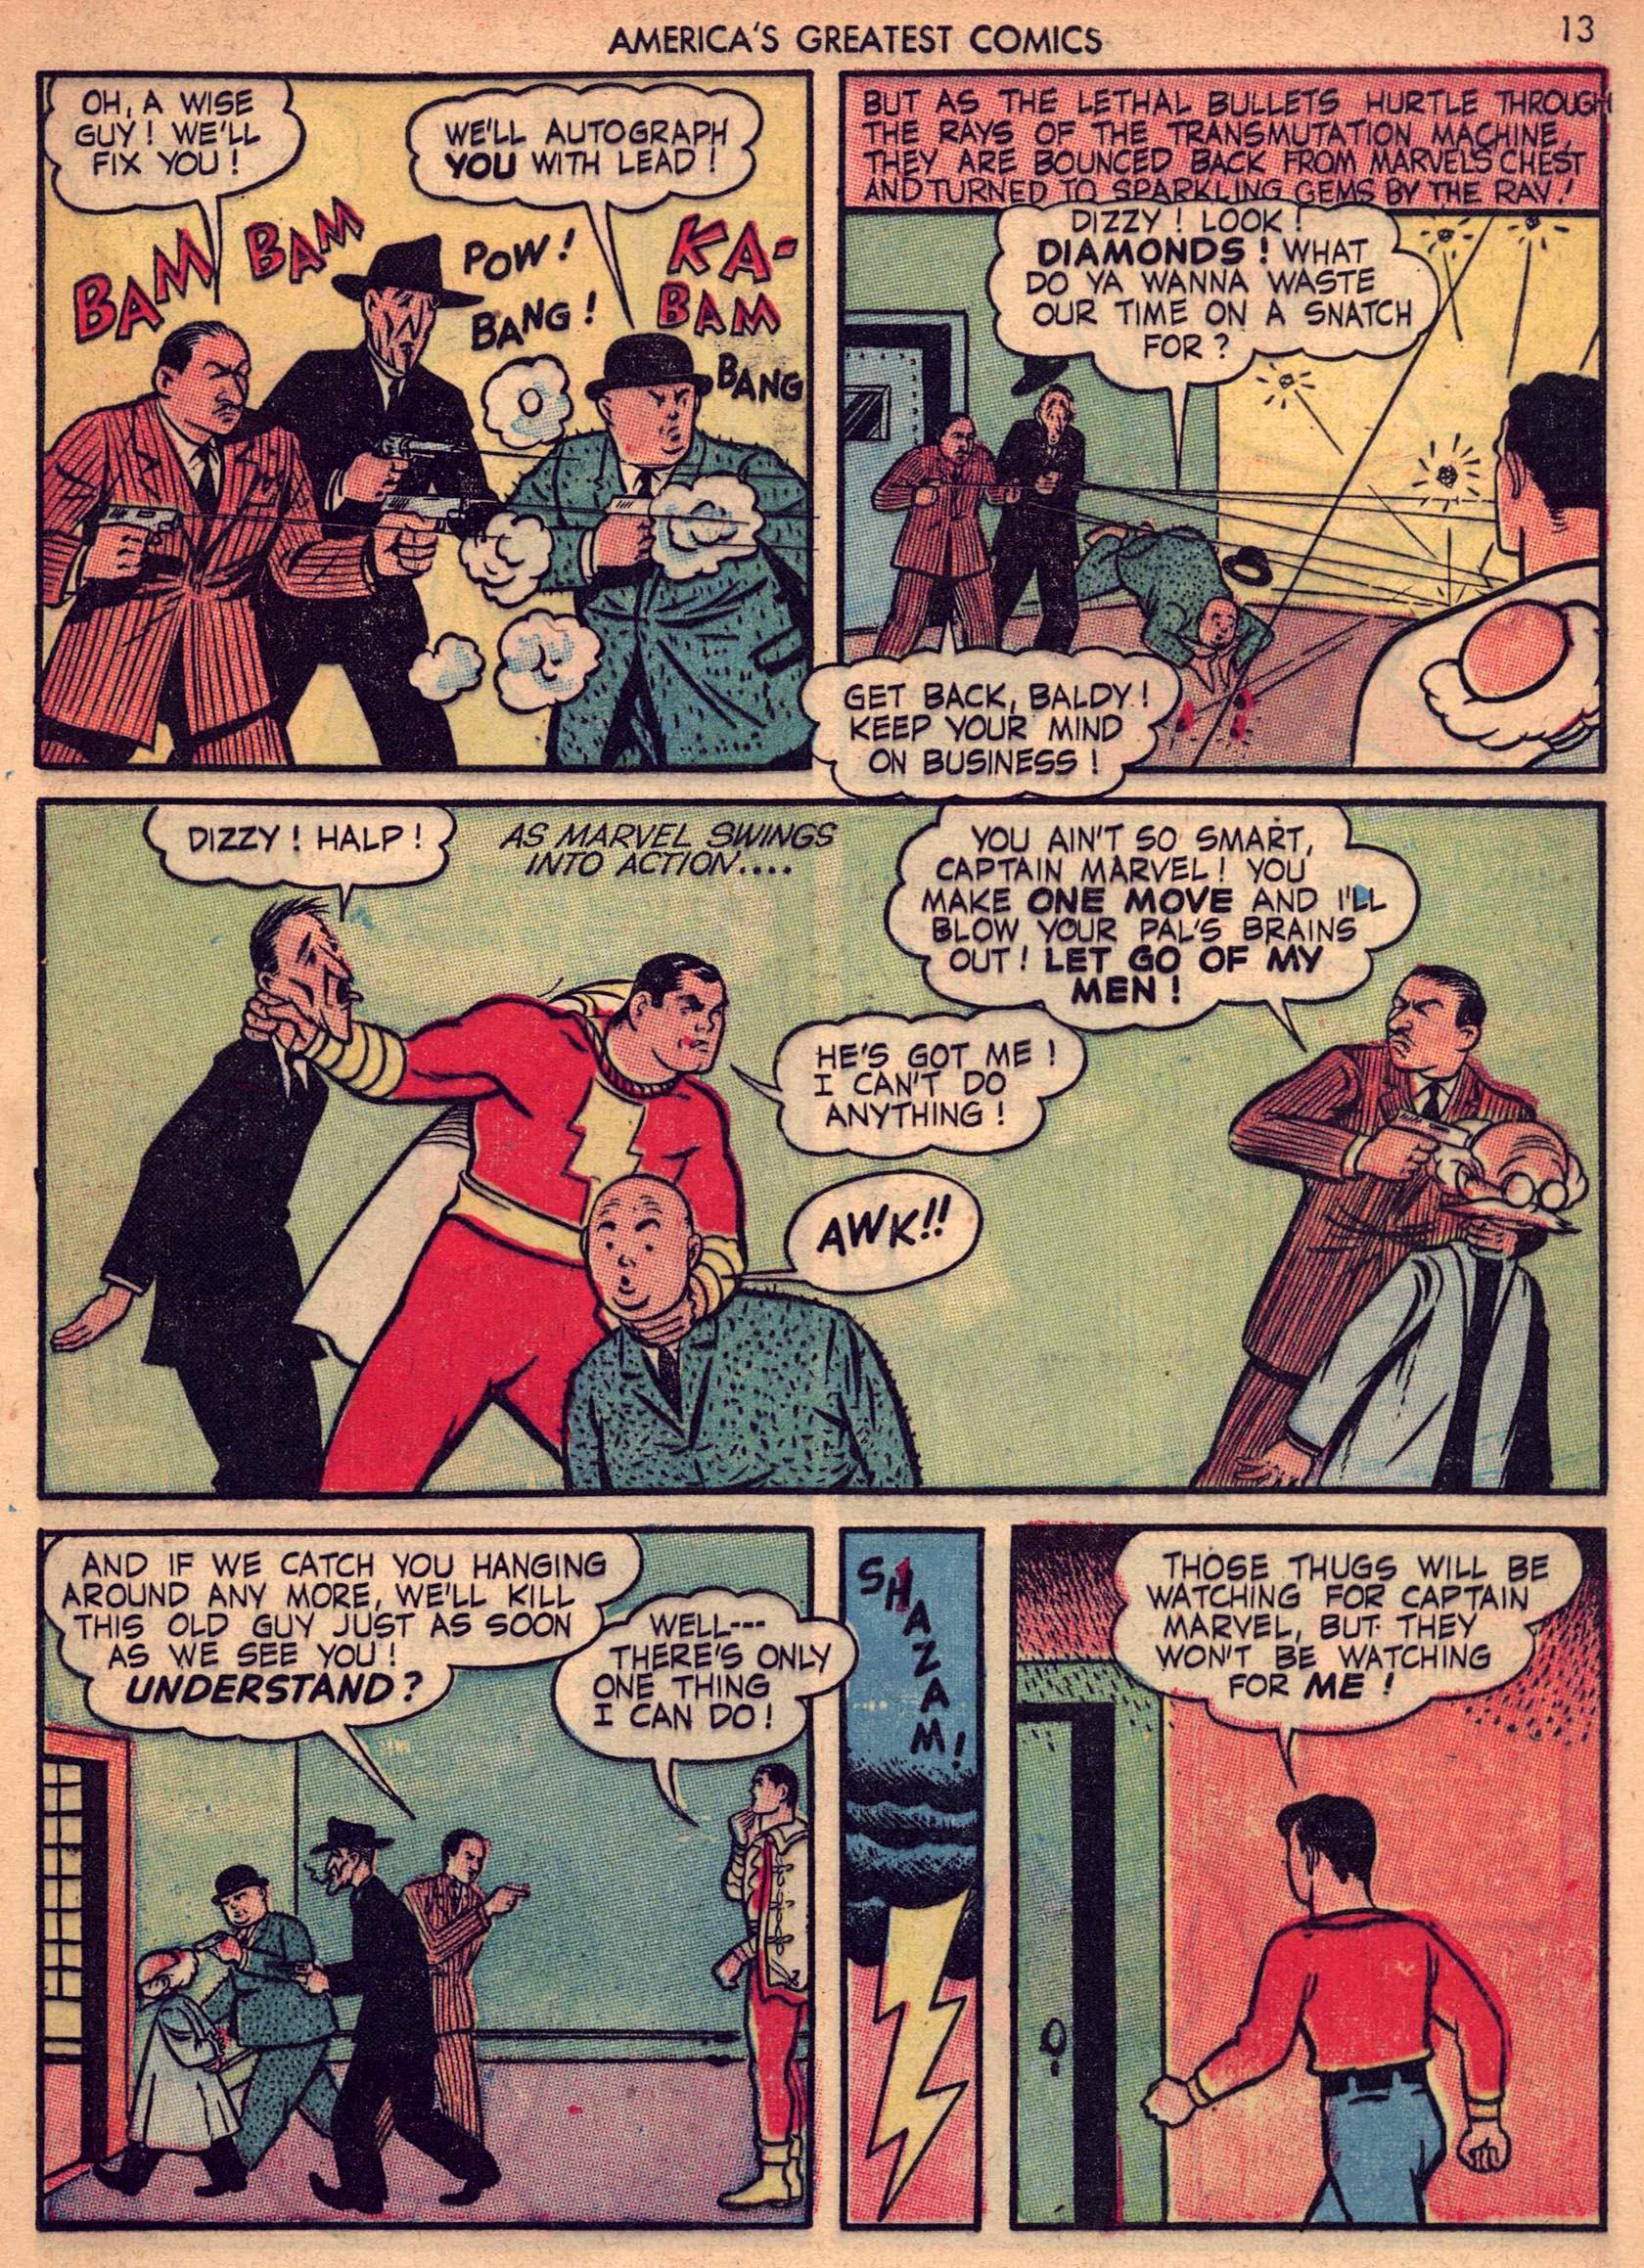 Read online America's Greatest Comics comic -  Issue #7 - 12